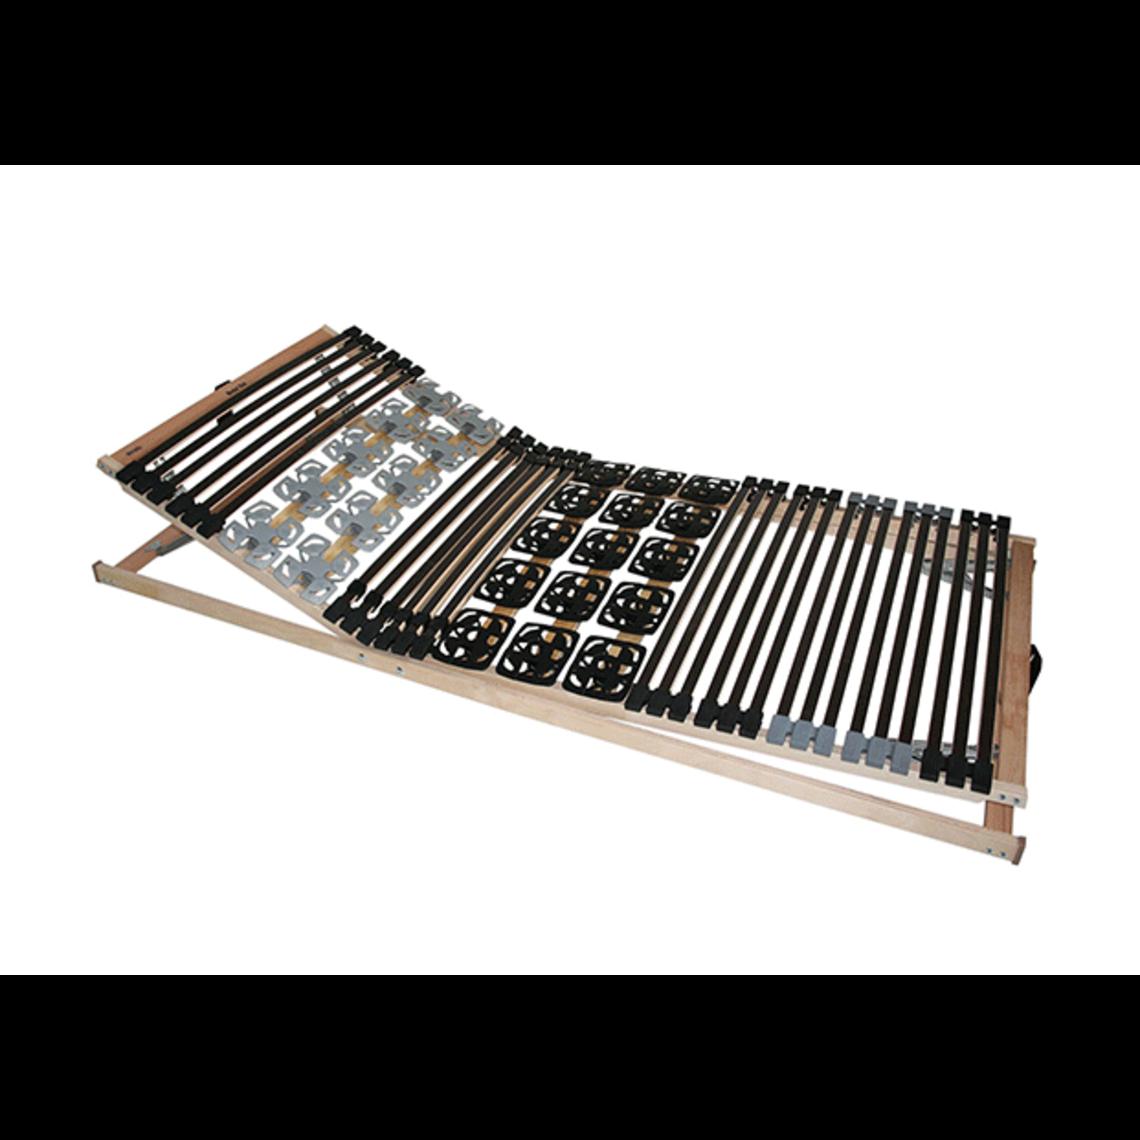 Full Size of Bett Lattenrost Elektrisch Verstellbar Befestigen Malm Quietscht Inklusive Und Matratze Mit Verstellbarem Ikea Knarrt Komplett Einstellen Welcher Ist Der Bett Bett Lattenrost